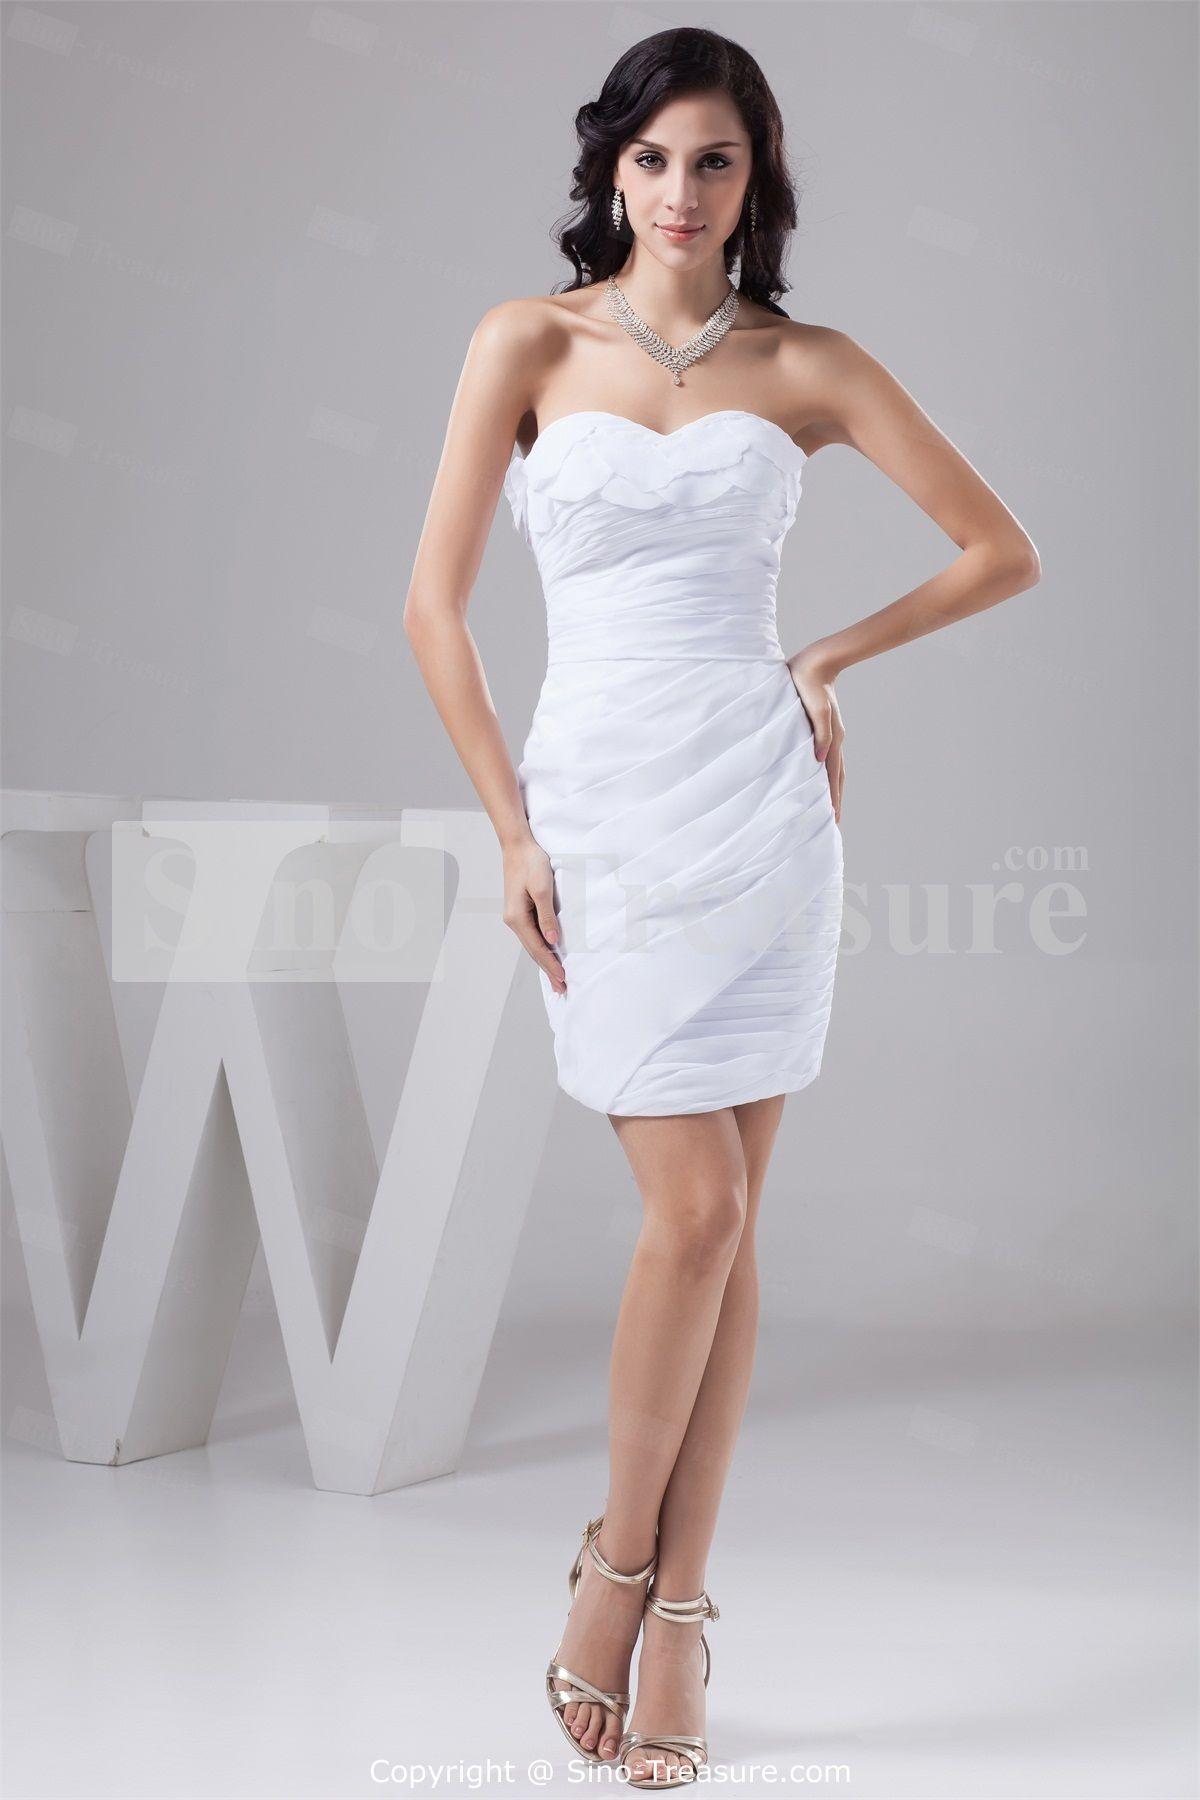 White Short Mini Chiffon Strapless Summer Bridesmaid Dresses Wedding Events Party